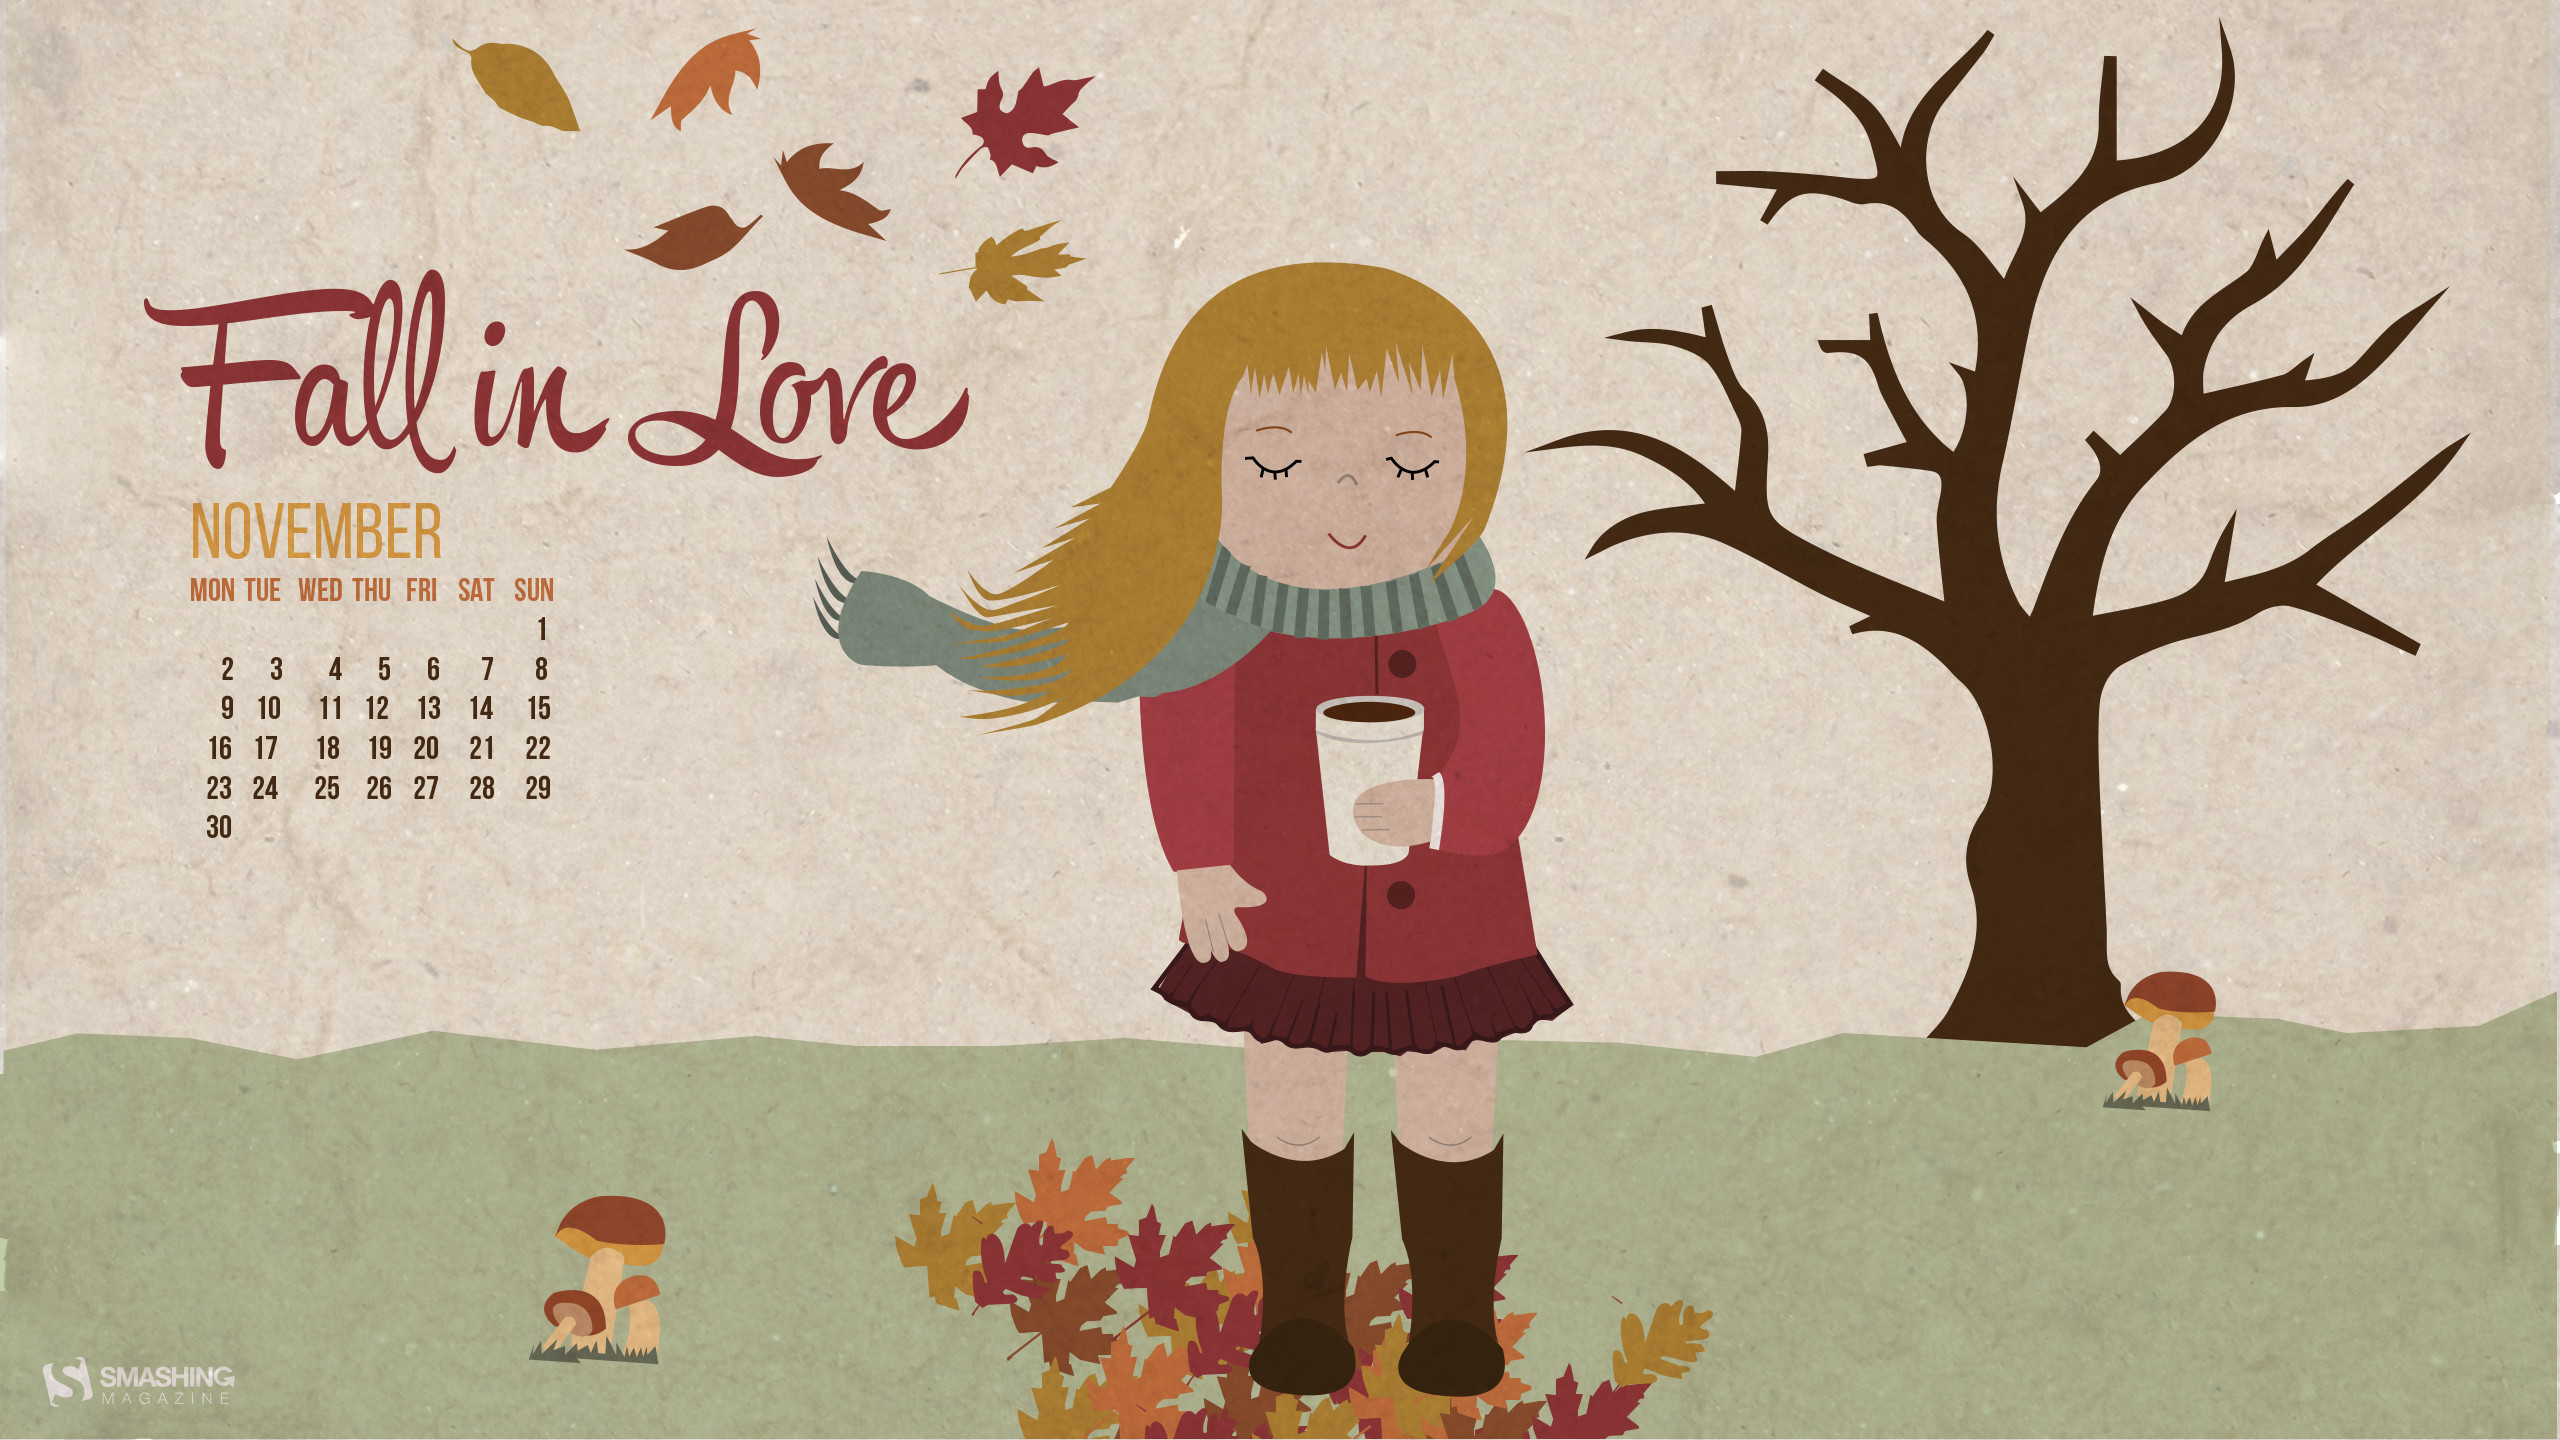 Autumn Love November 2015 Calendars Desktop Wallpaper-2560×1440